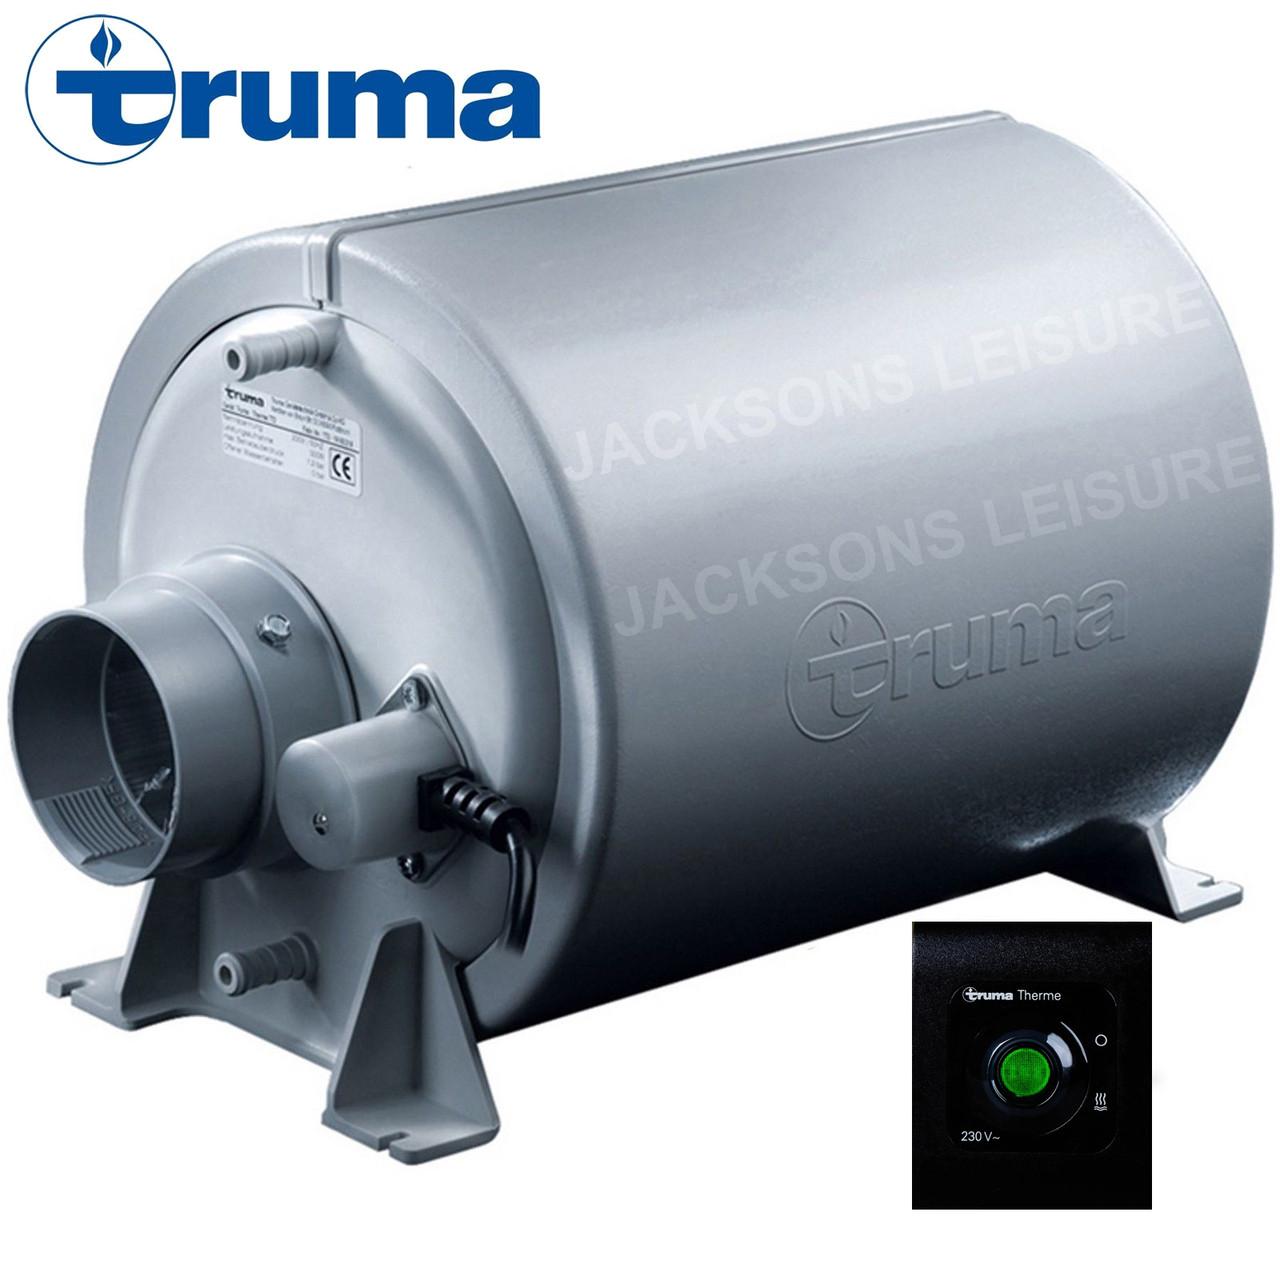 truma therme tt2 electric caravan campervan water heater. Black Bedroom Furniture Sets. Home Design Ideas